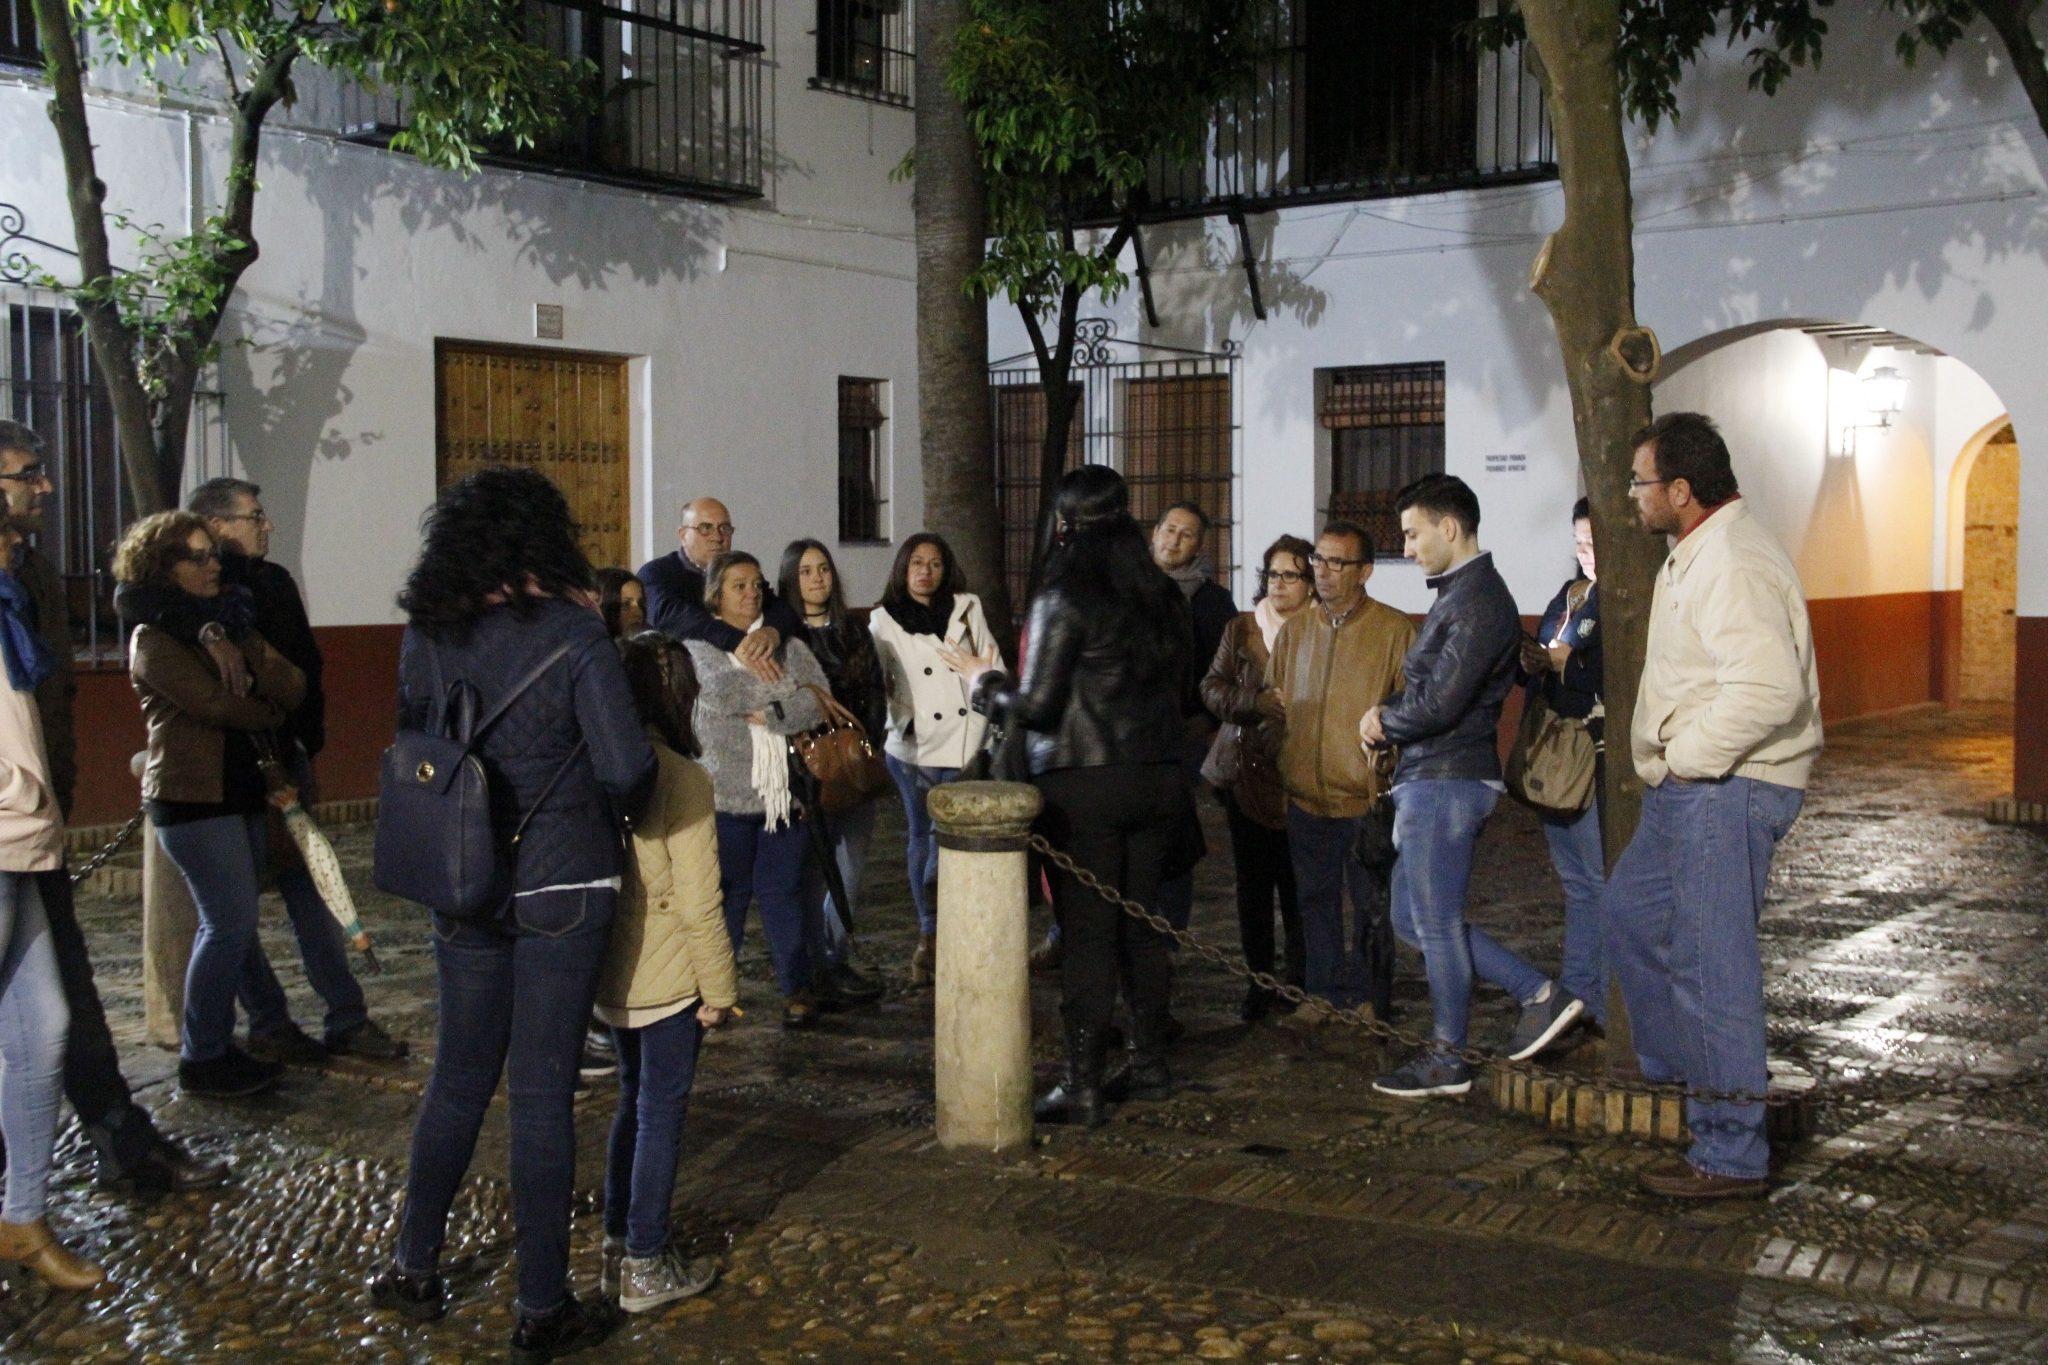 rutas Sevilla, conocer Sevilla, visitas guiadas Sevilla, experiencias culturales Sevilla, rutas . Tours por Sevilla